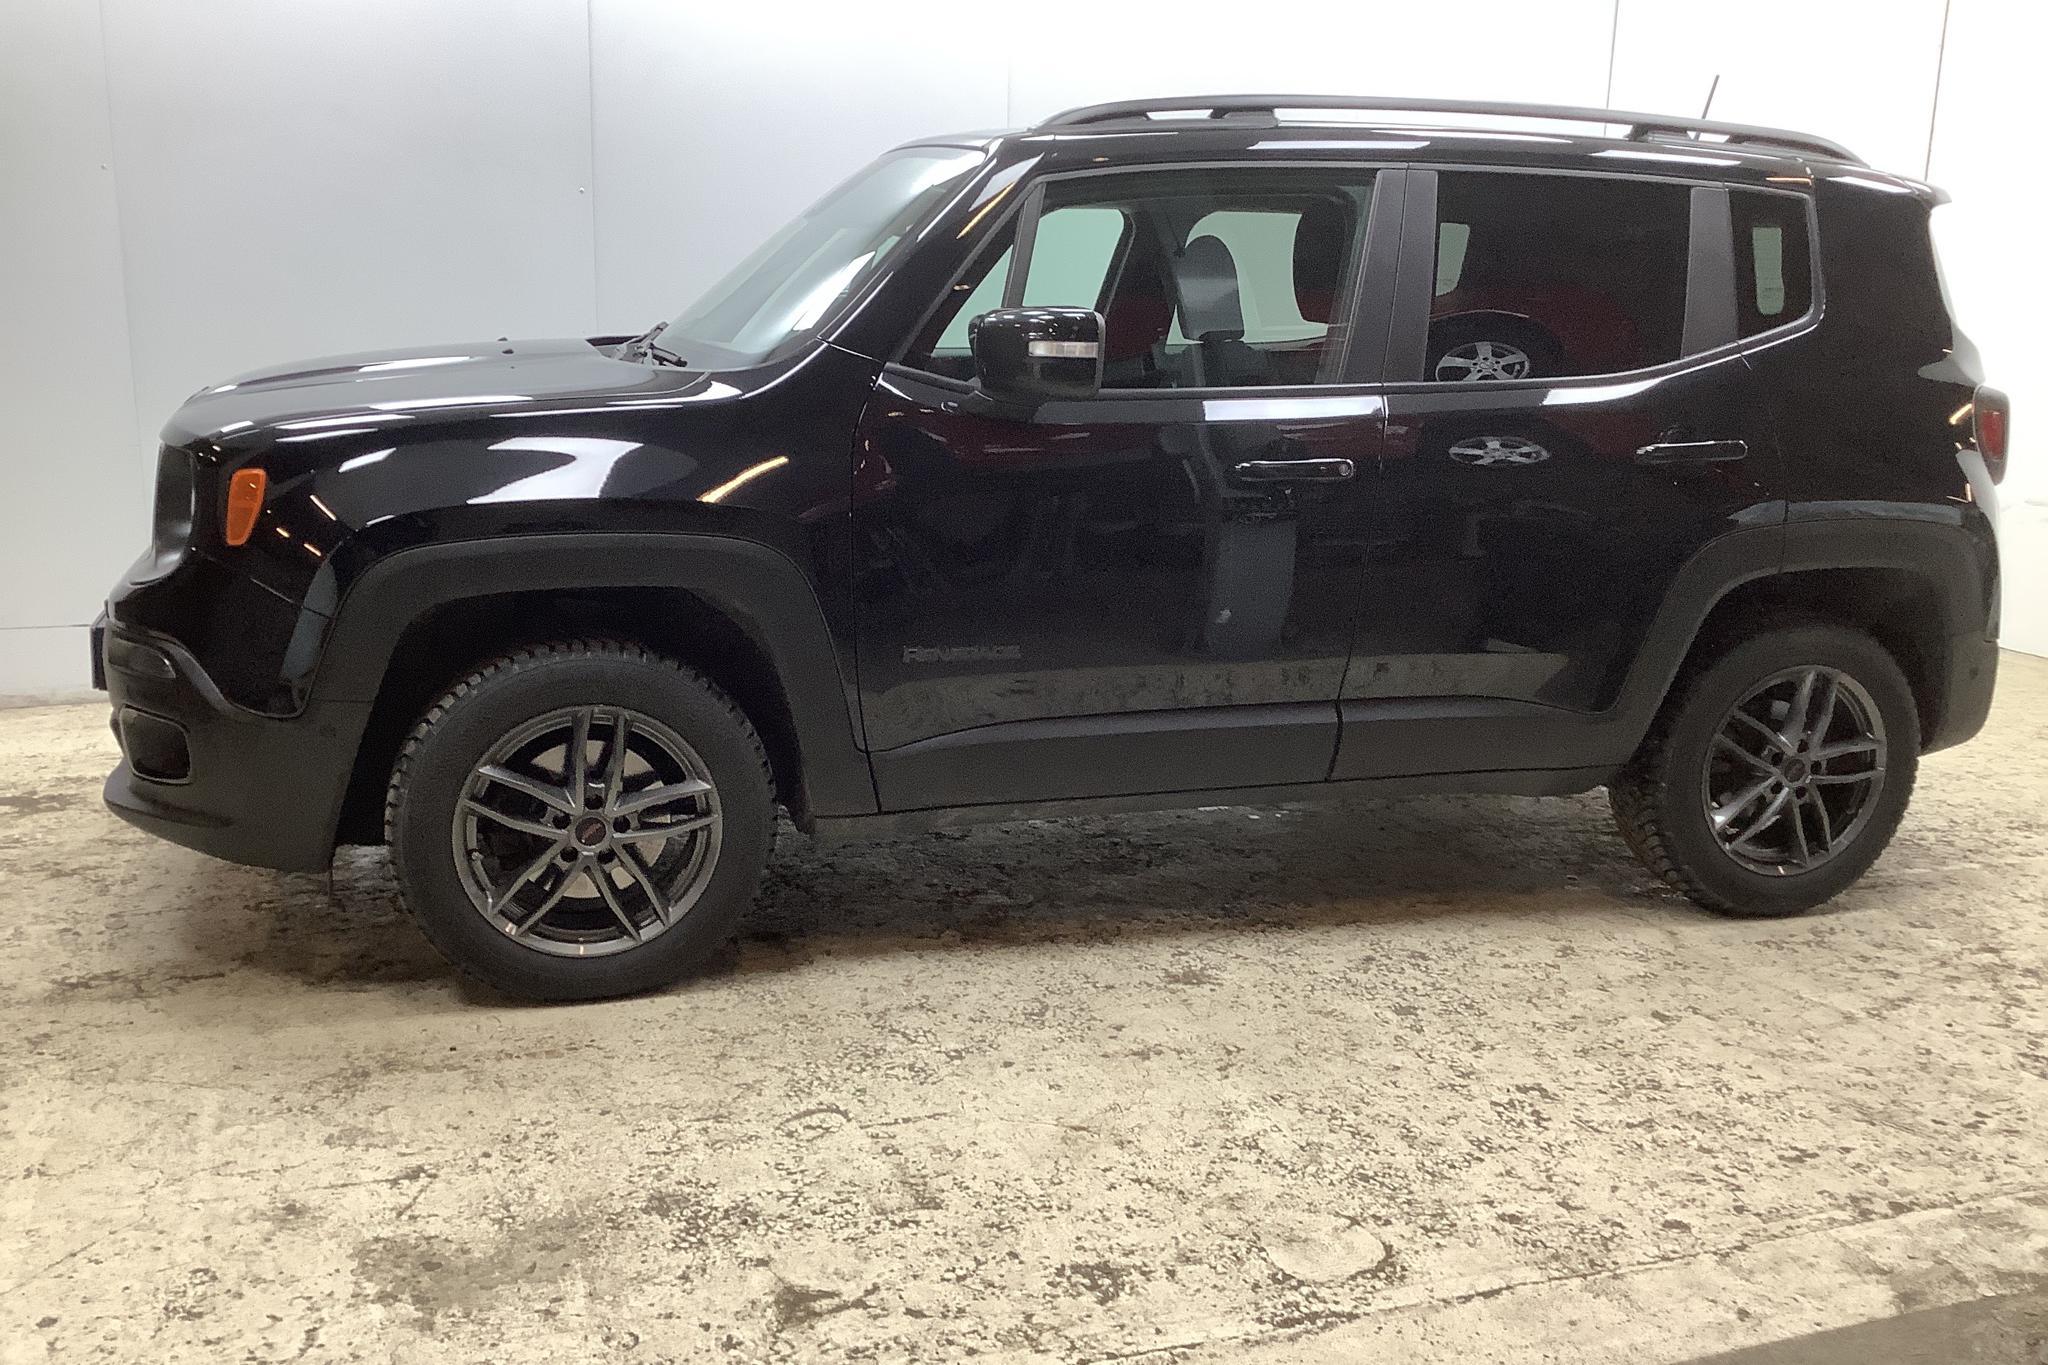 Jeep Renegade 1.4 MultiAir 4WD (170hk) - 3 734 mil - Automat - svart - 2018